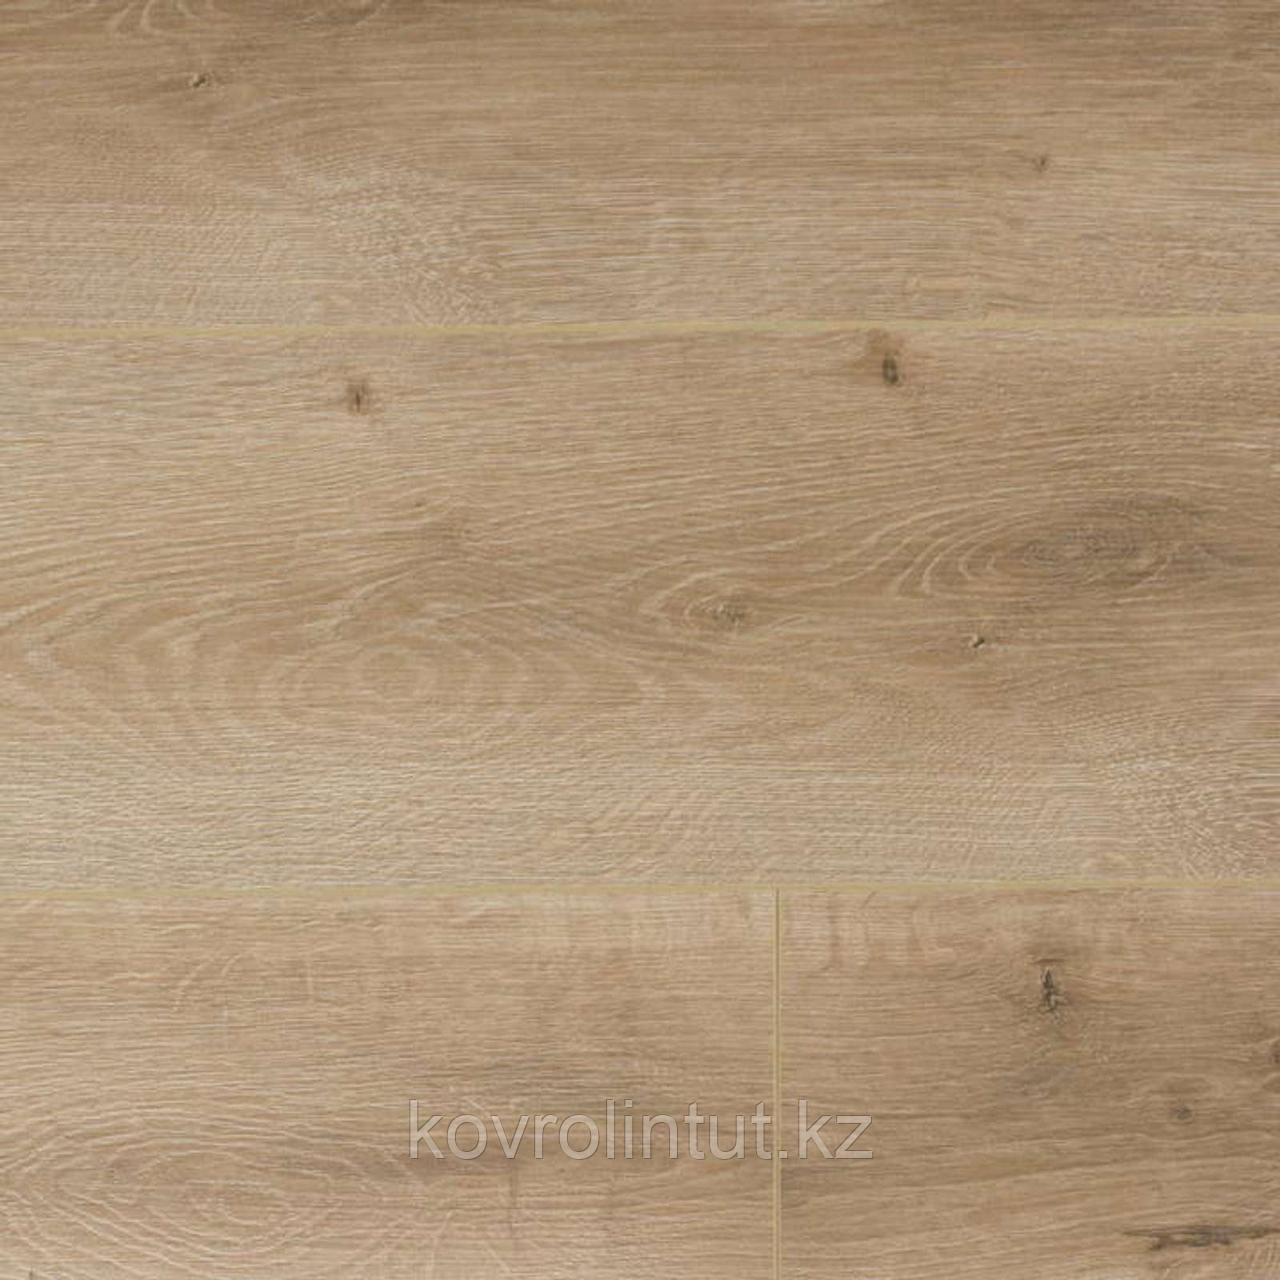 Ламинат Sommer коллекция Nordica Дуб Стокгольм 1 кл 504486004, 194х1292х8мм, 32кл (8 шт/2,005м2)